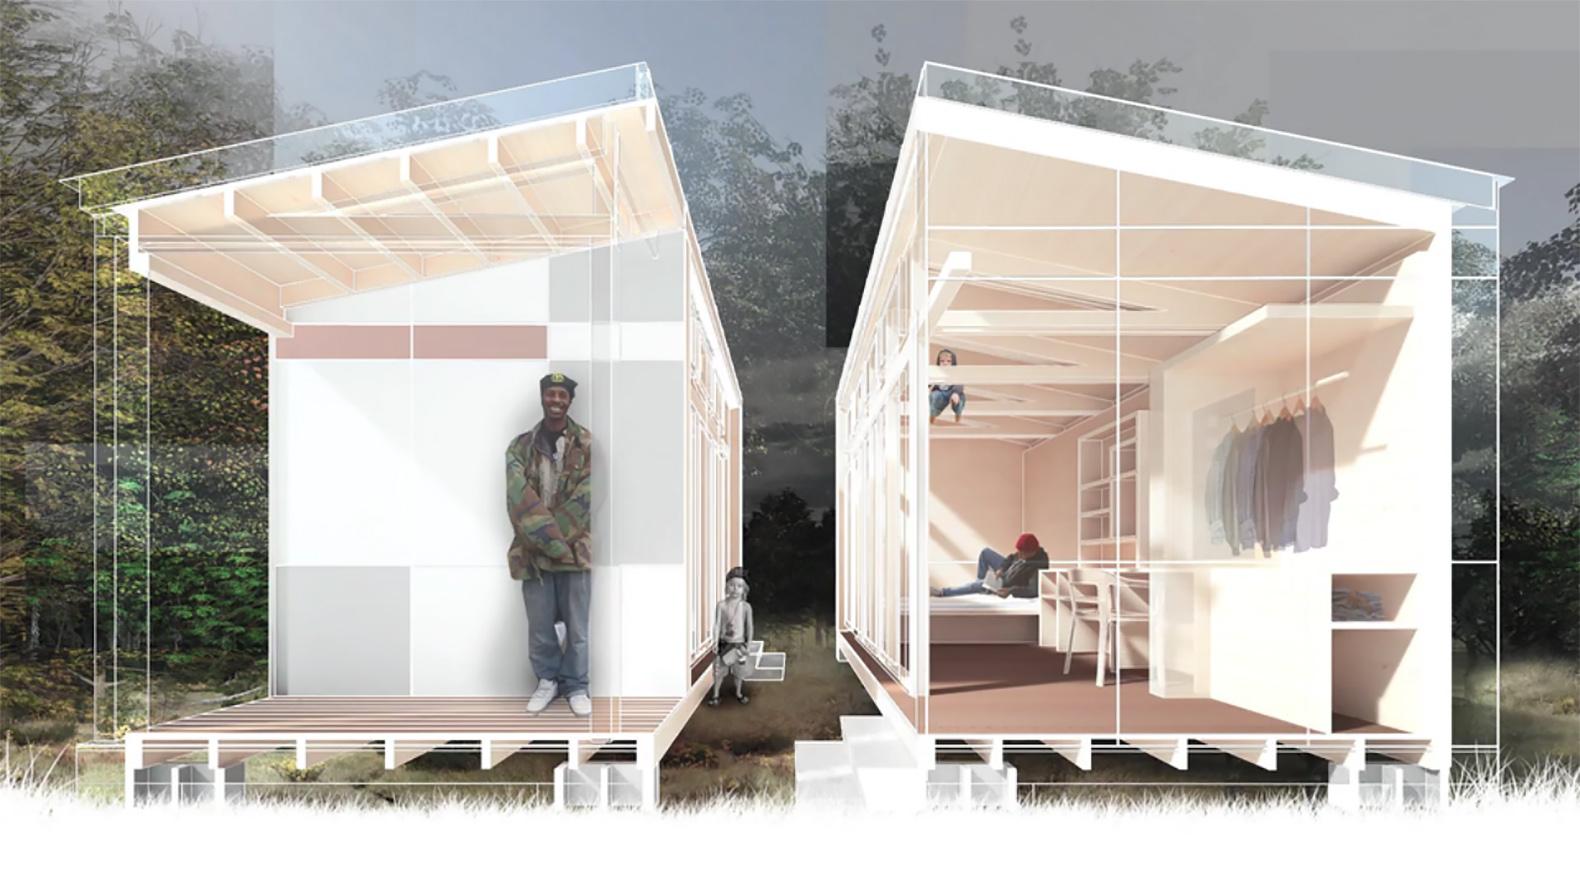 Low Income Housing Inhabitat Green Design Innovation